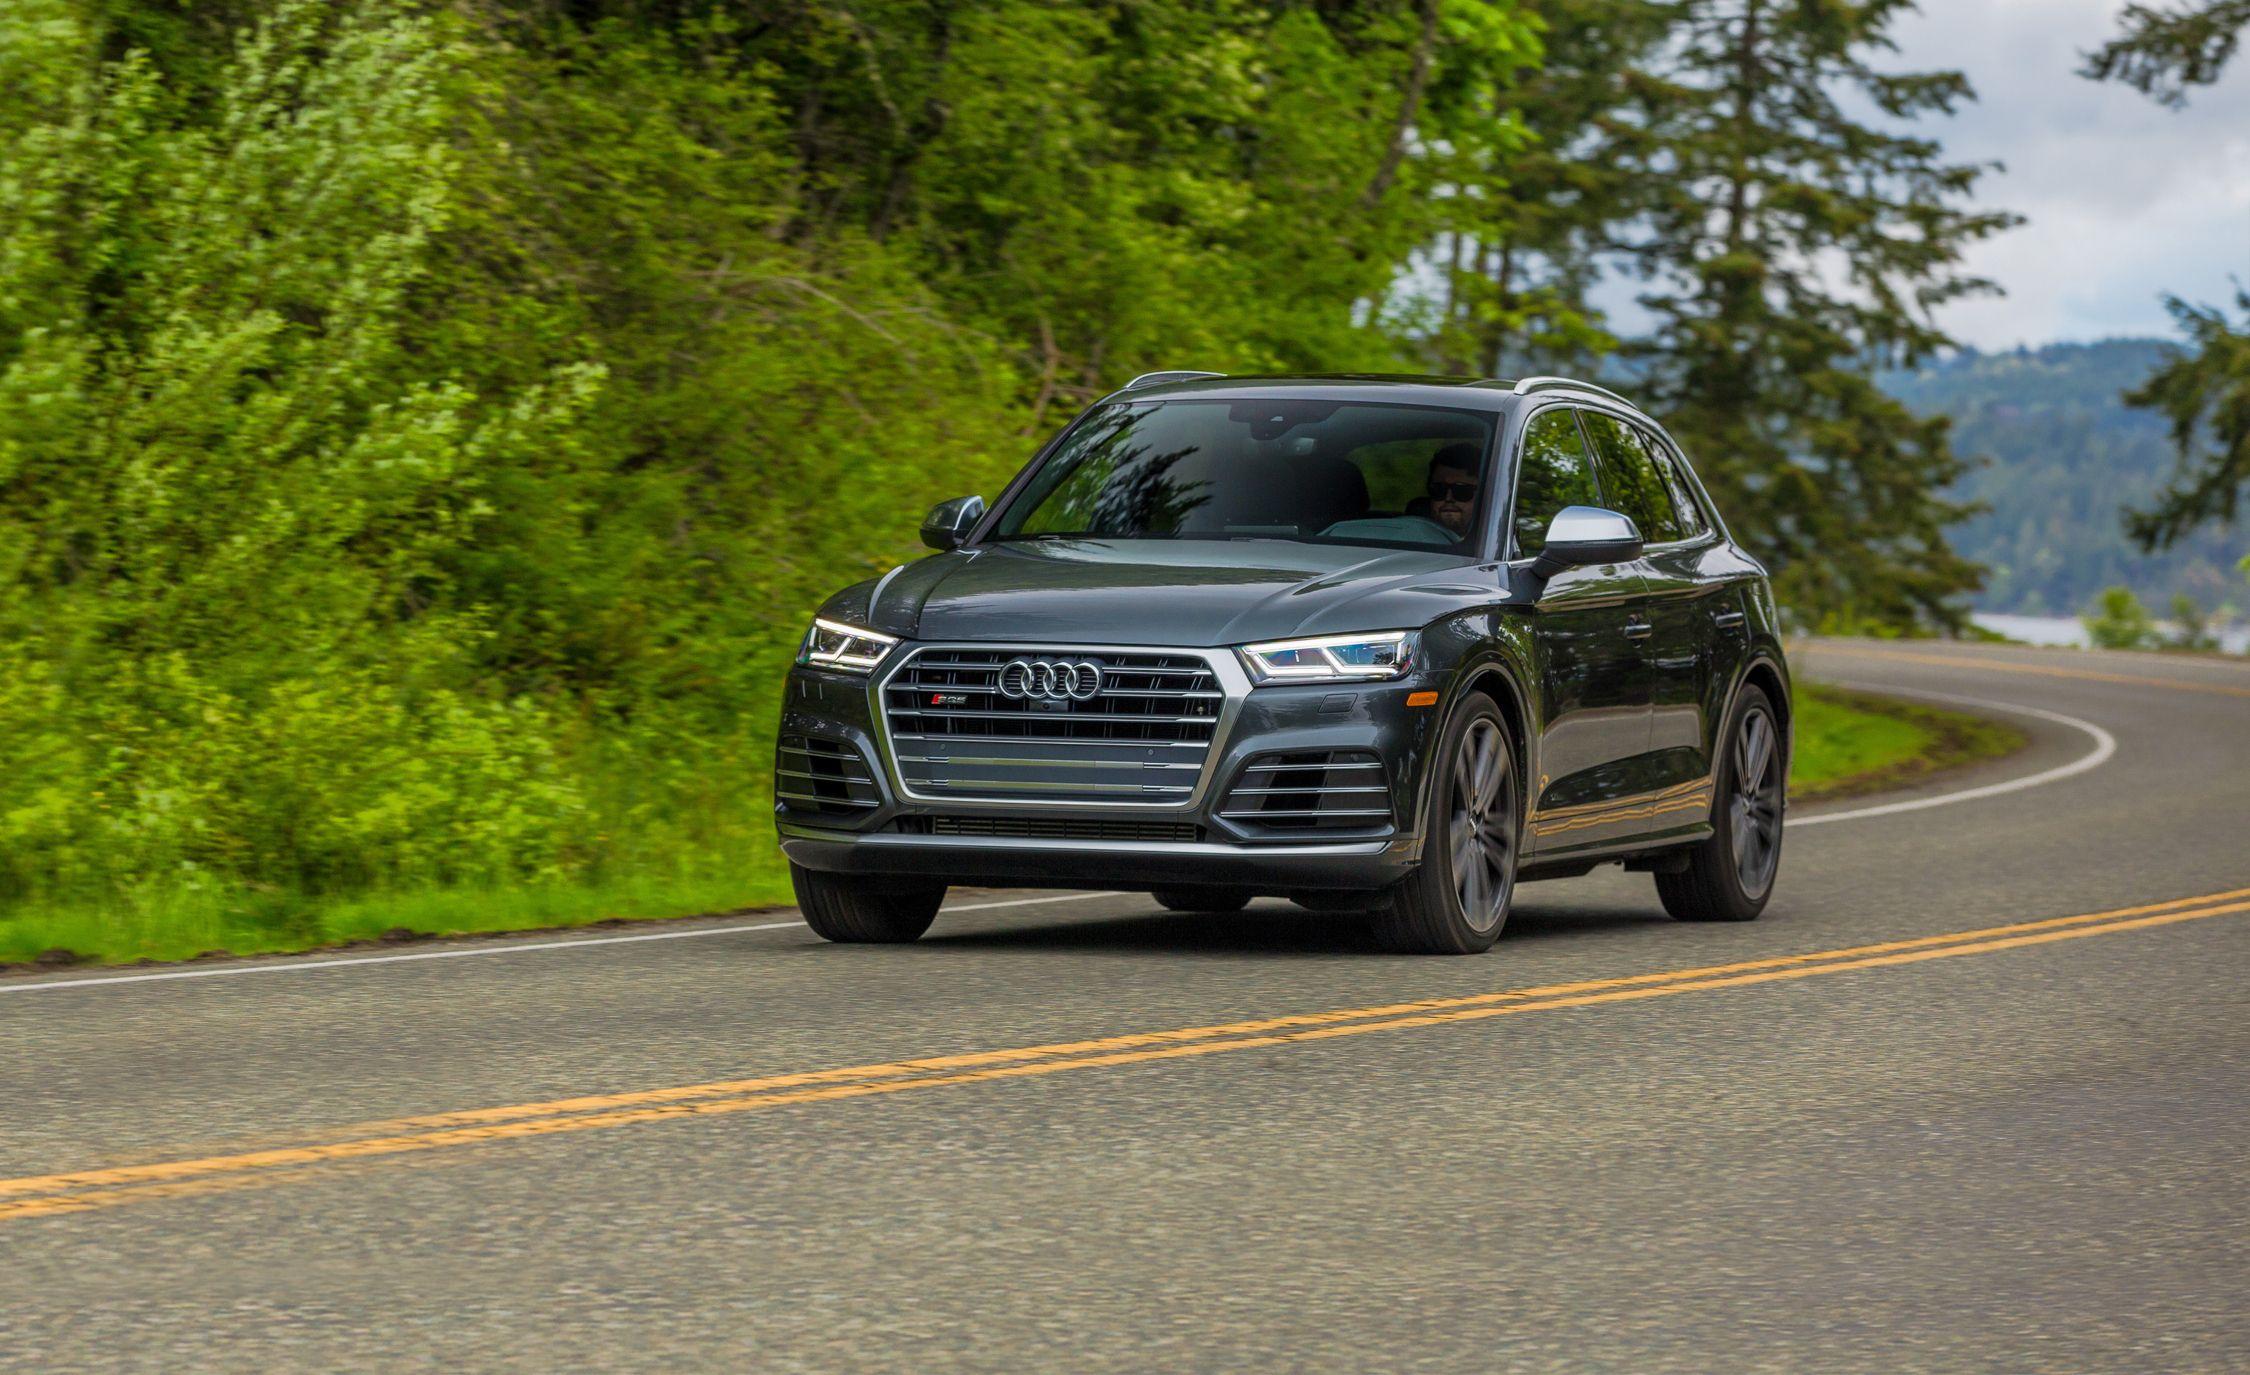 Kekurangan Audi Sq5 2018 Spesifikasi